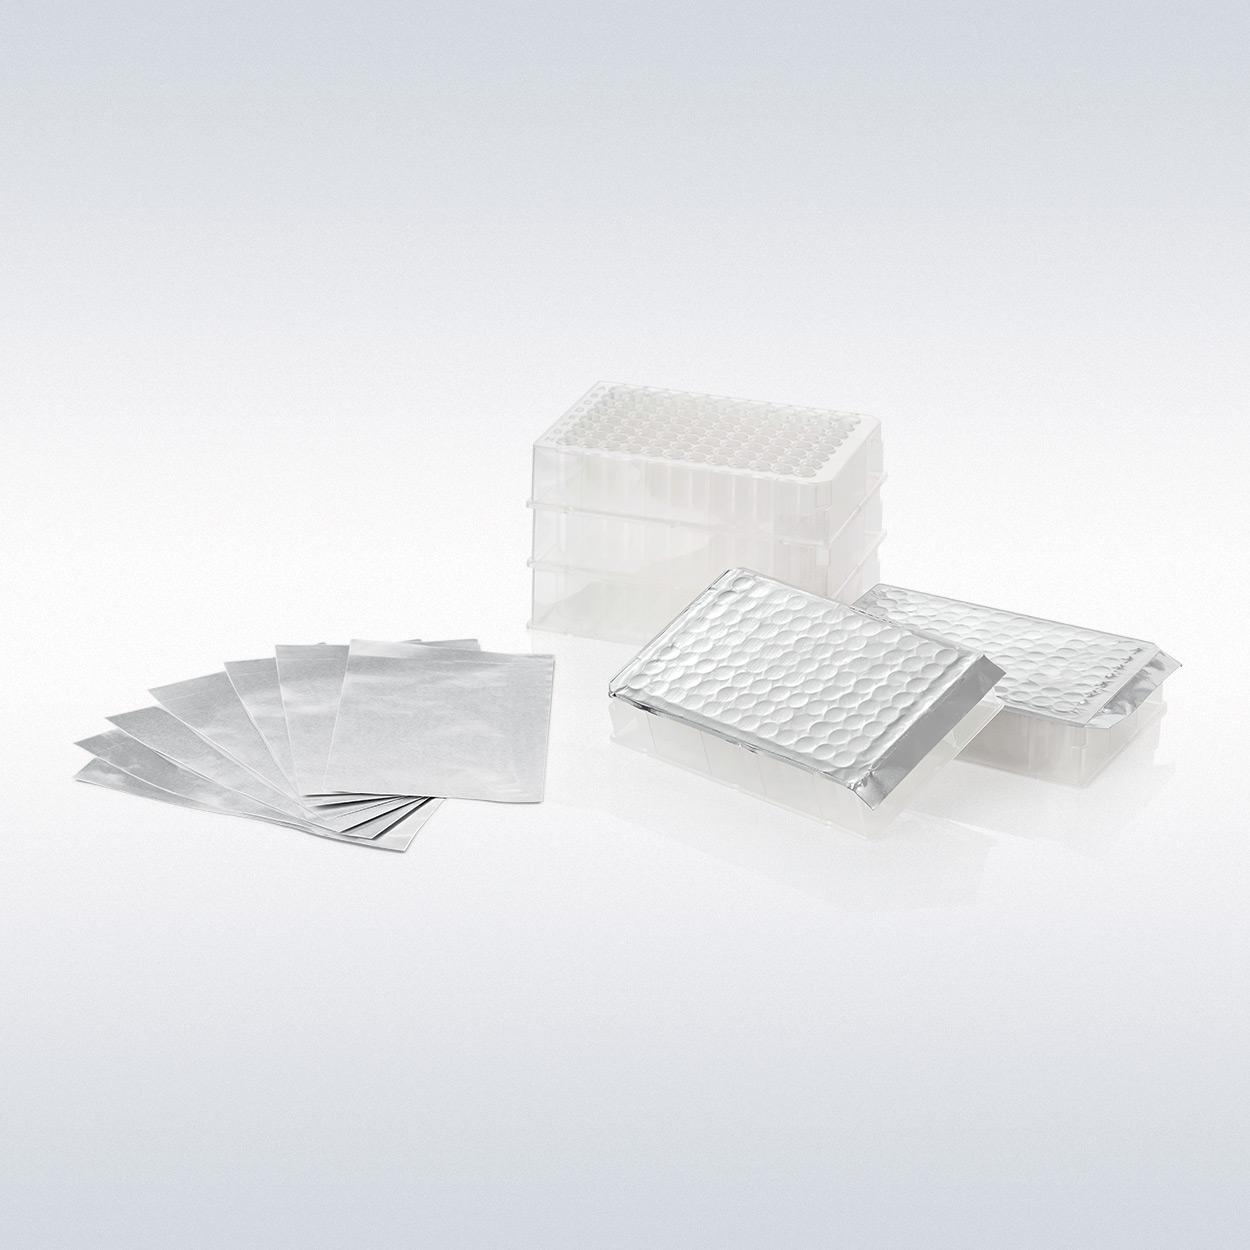 MACSwell™ Deepwell Plates